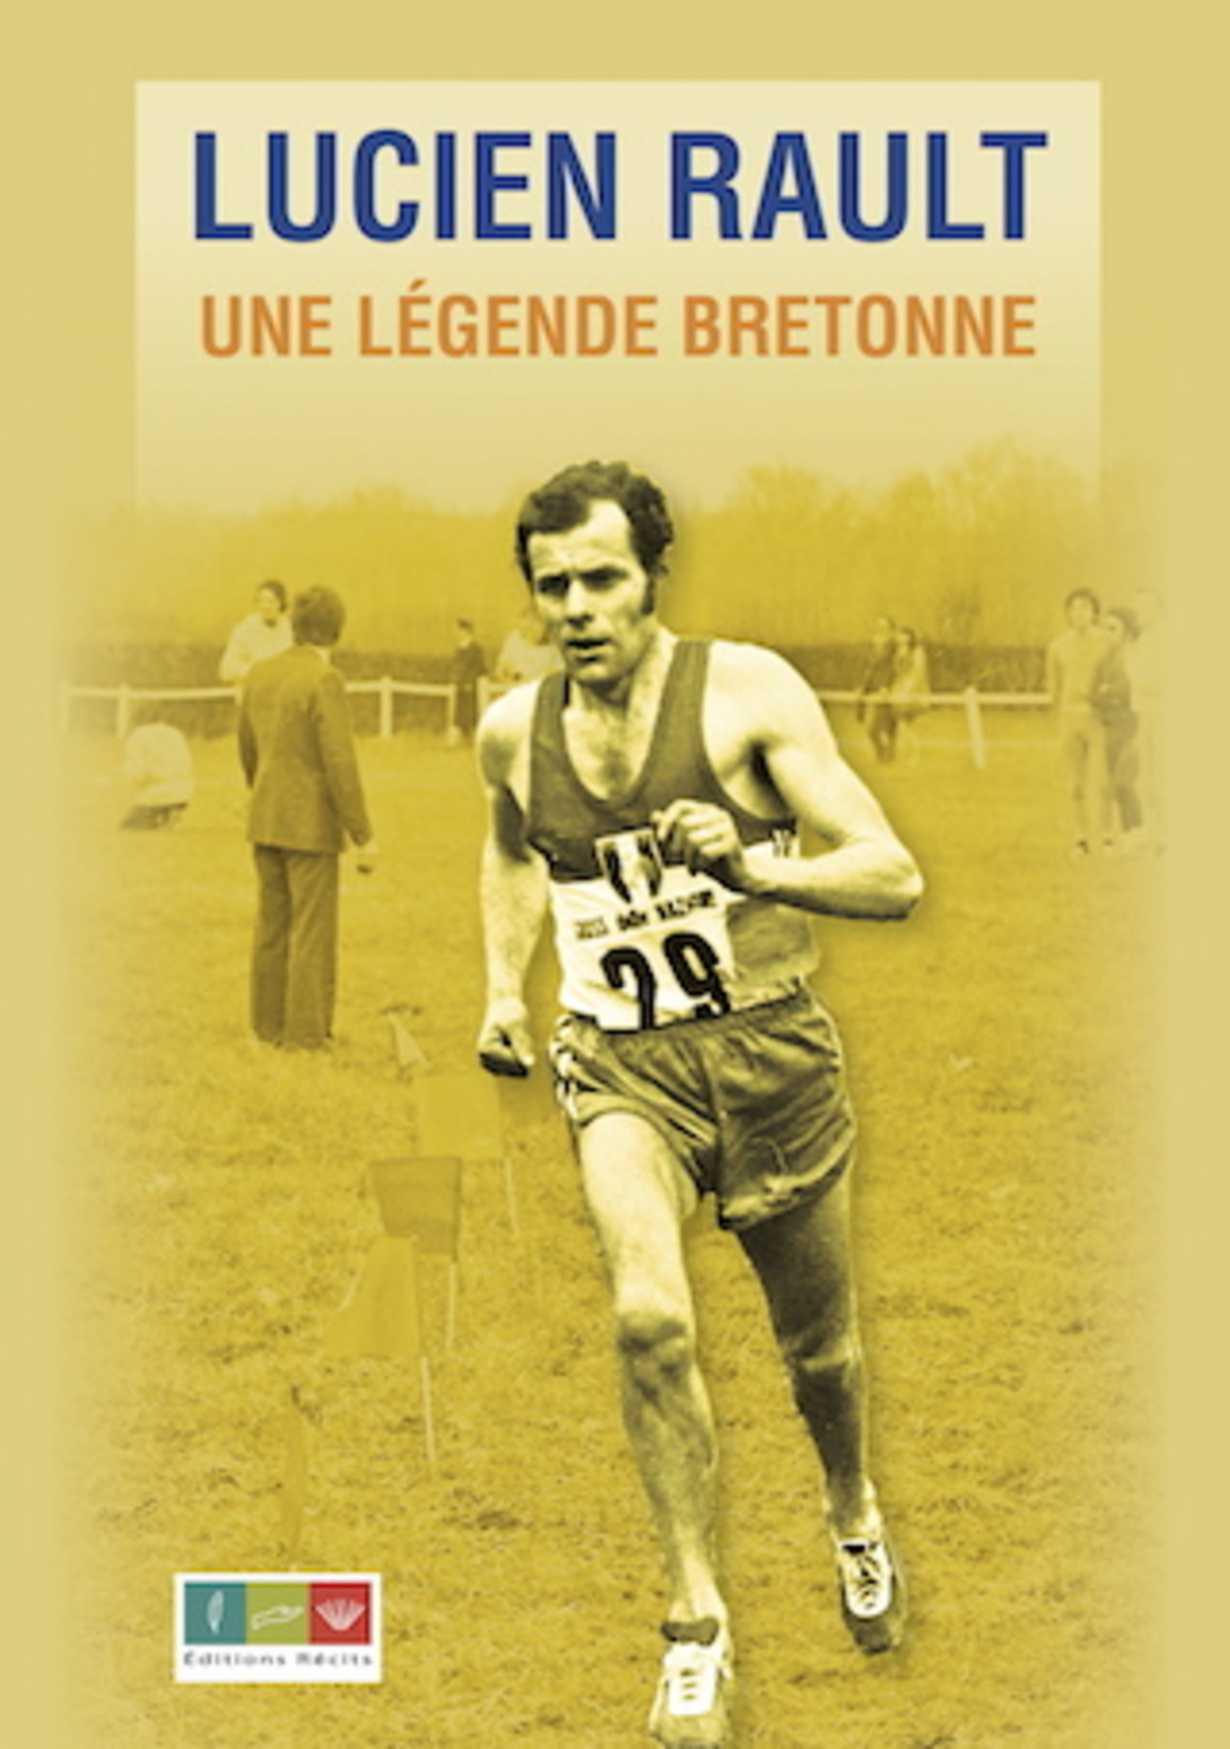 lucien rault, une legende bretonne